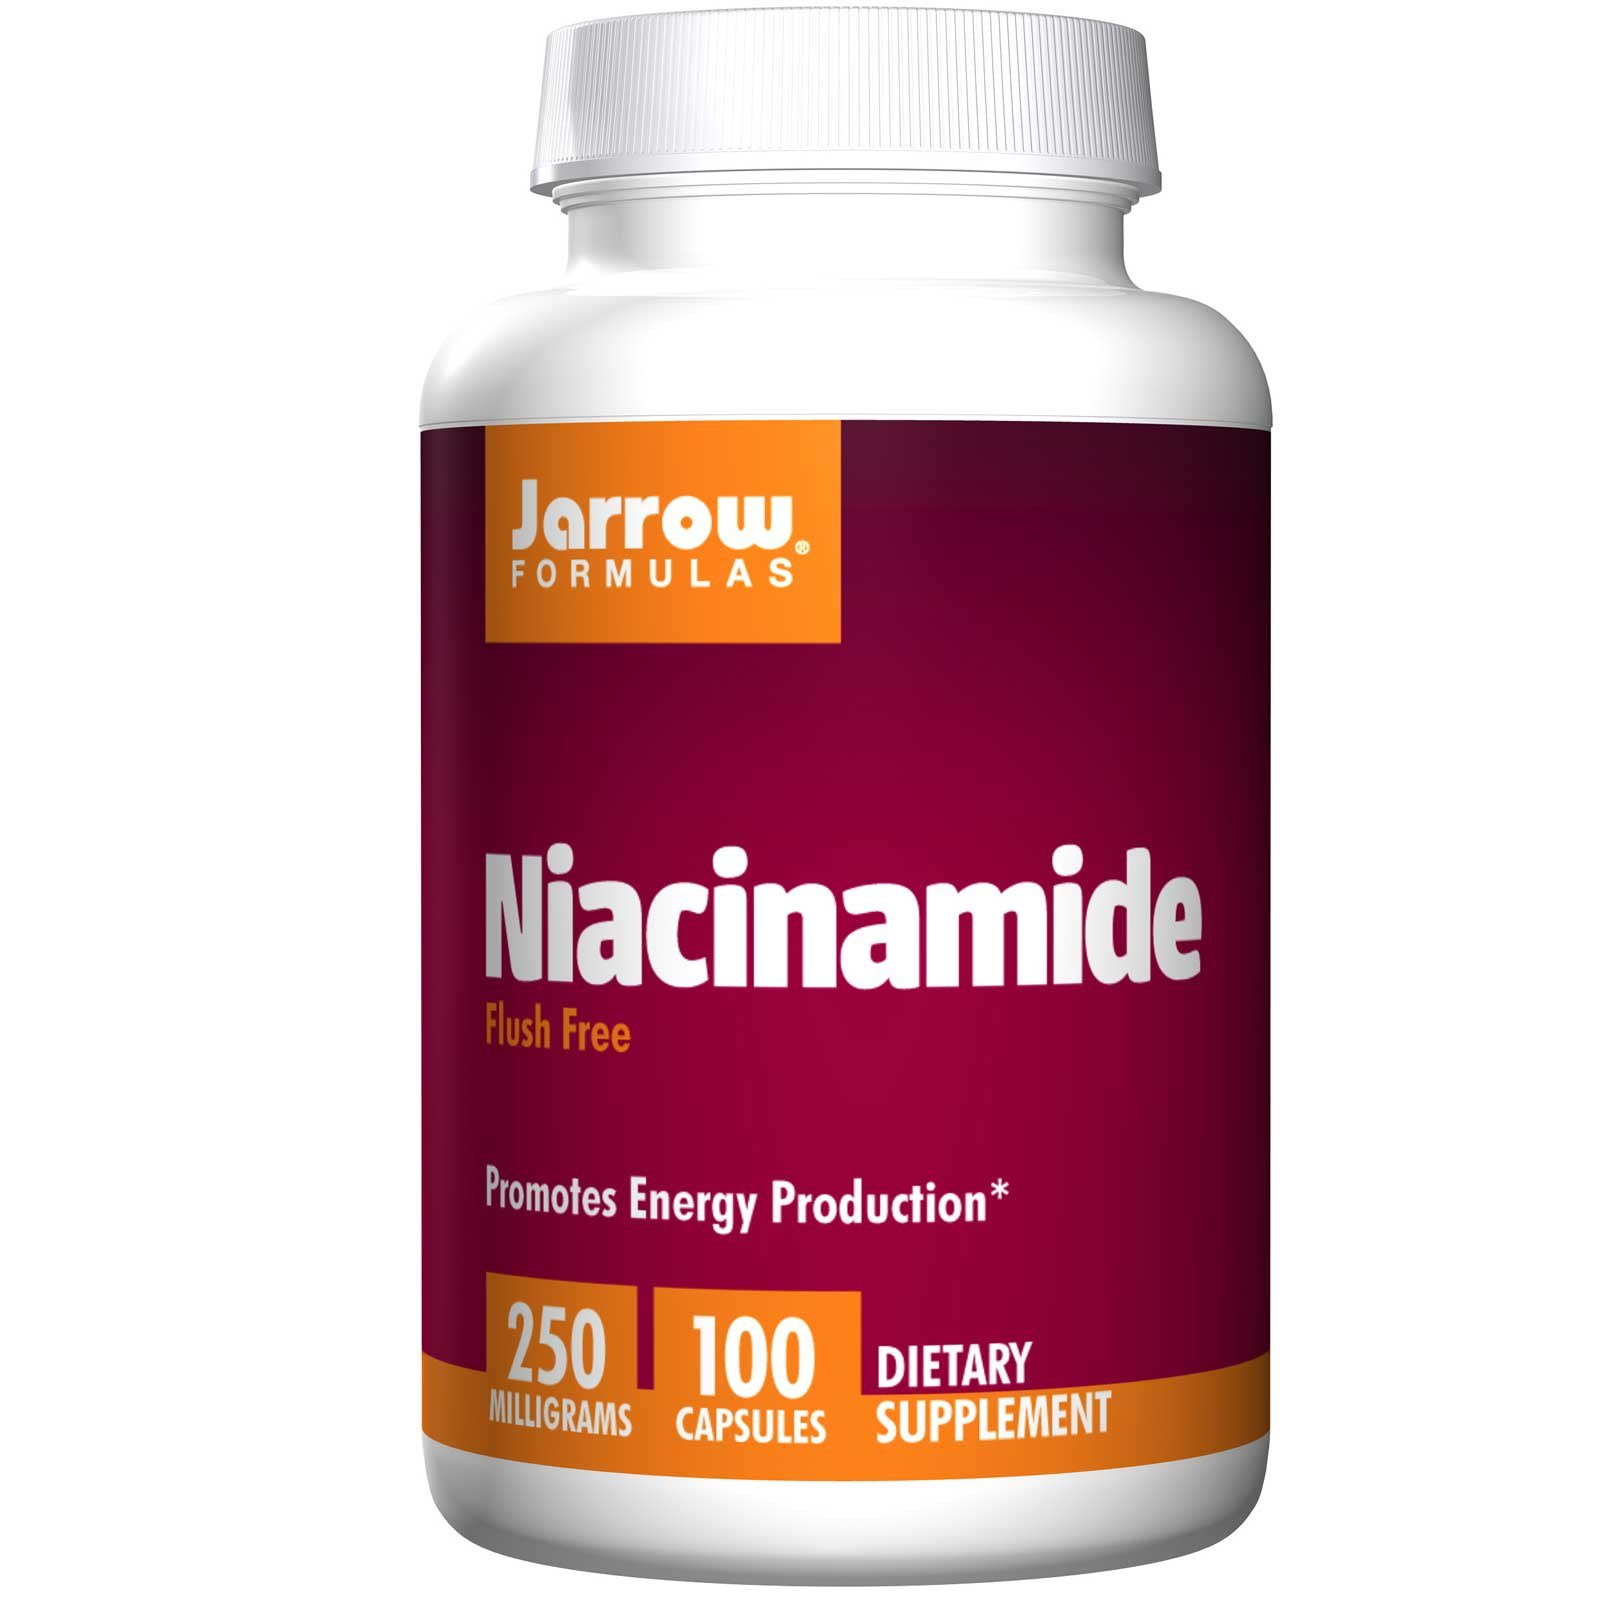 Image of Niacinamide 250 mg (100 Capsules) - Jarrow Formulas 0790011180098